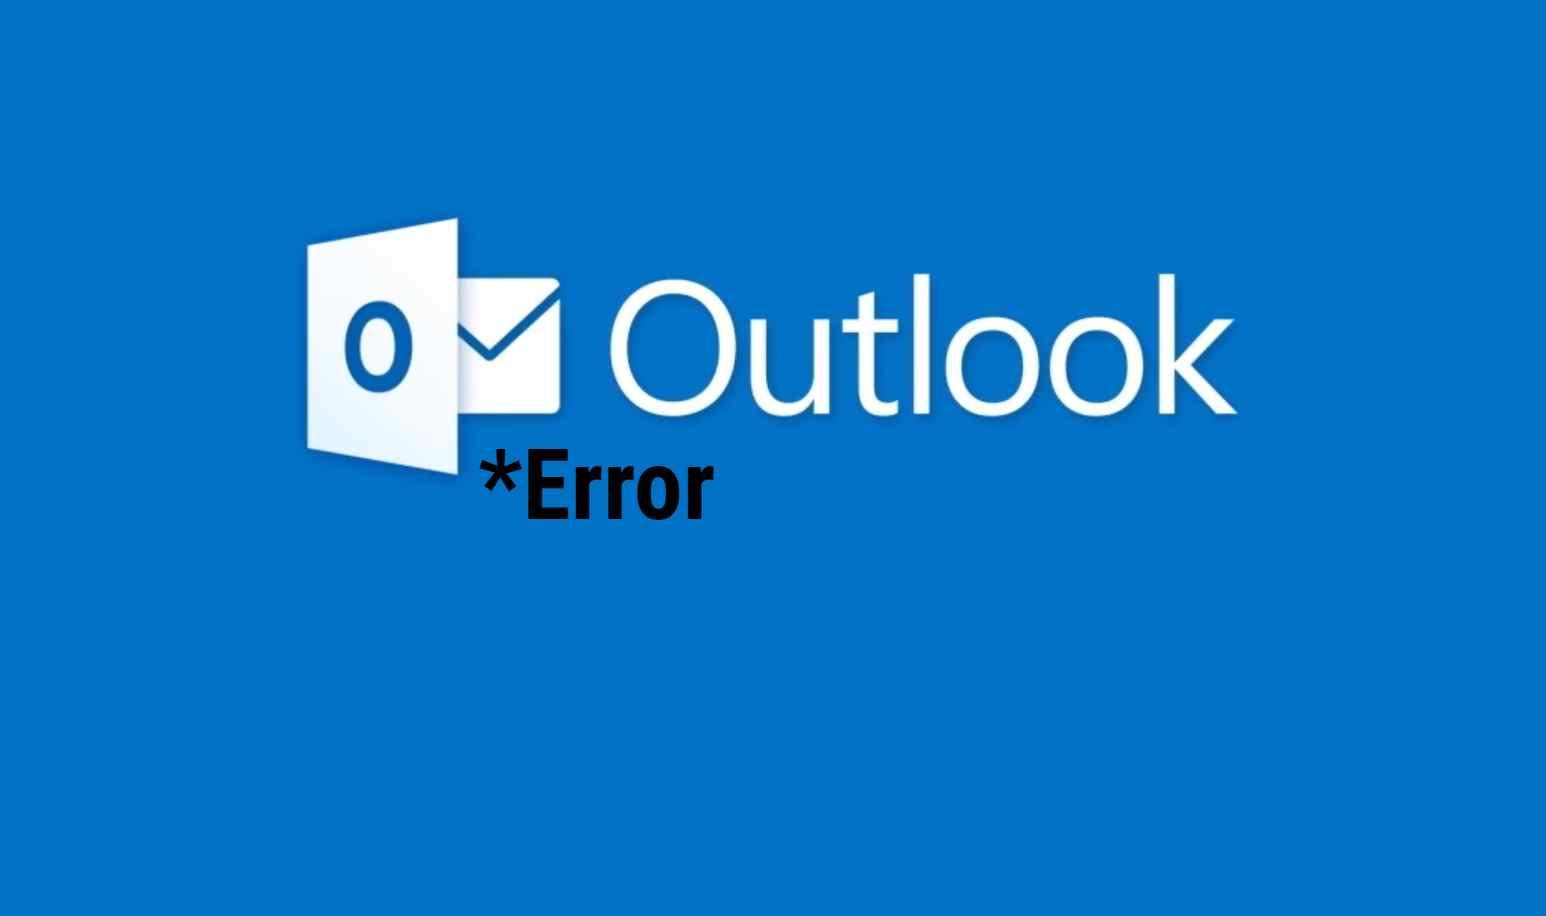 [pii_email_844c7c48c40fcebbdbbb] Error